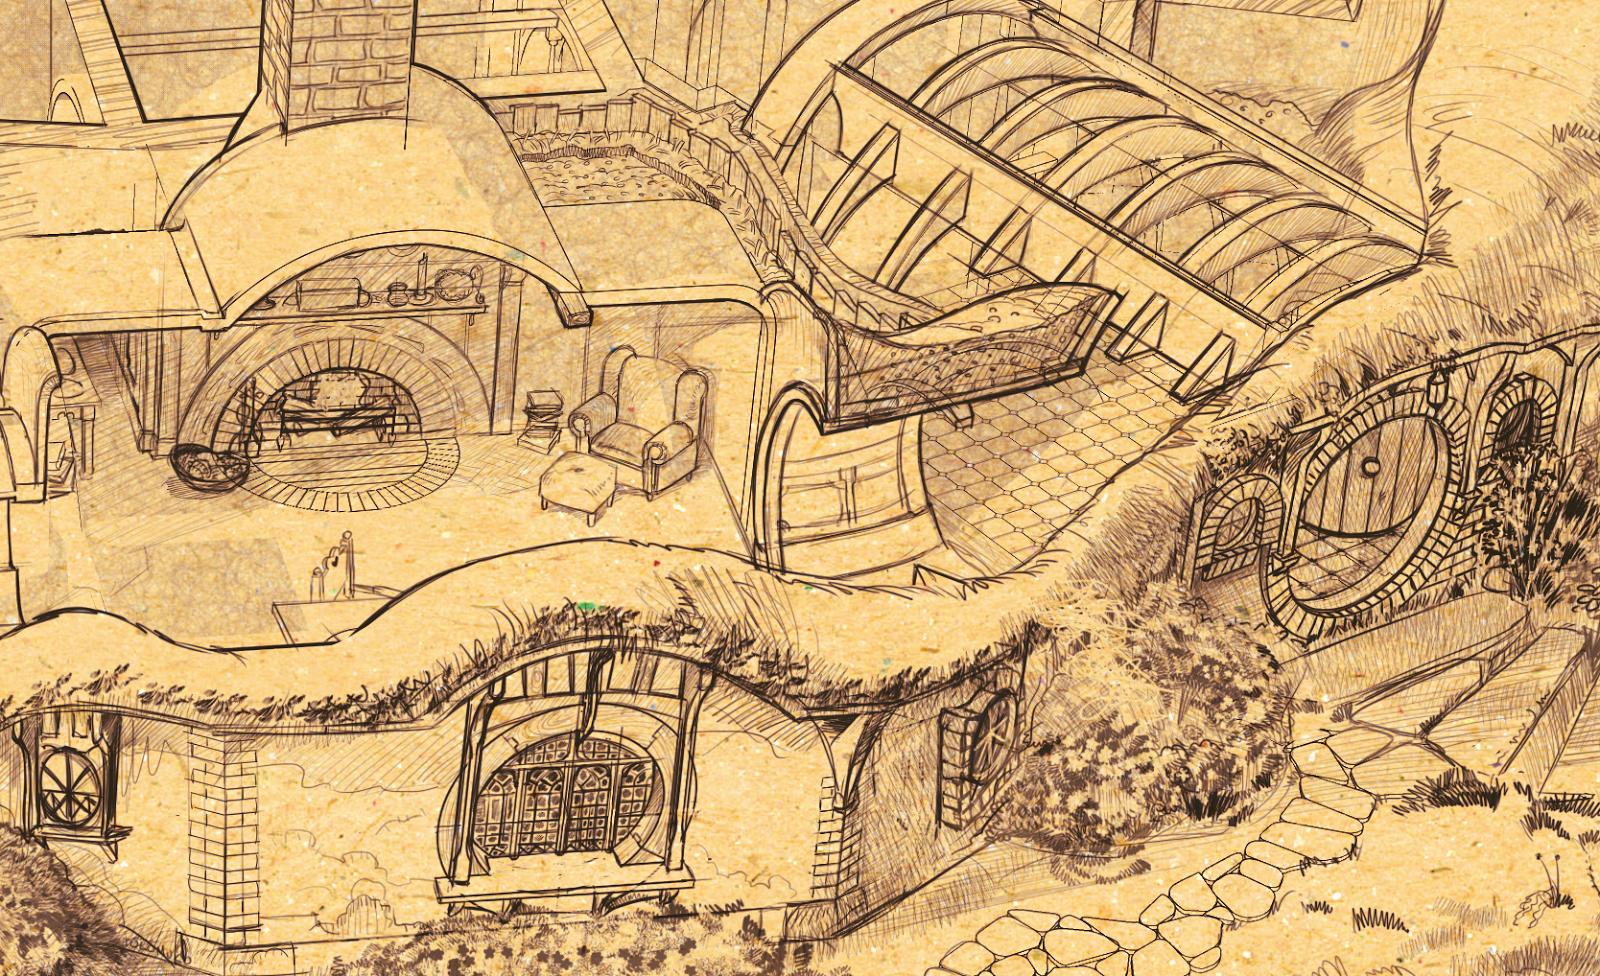 - La casa de los hobbits ...